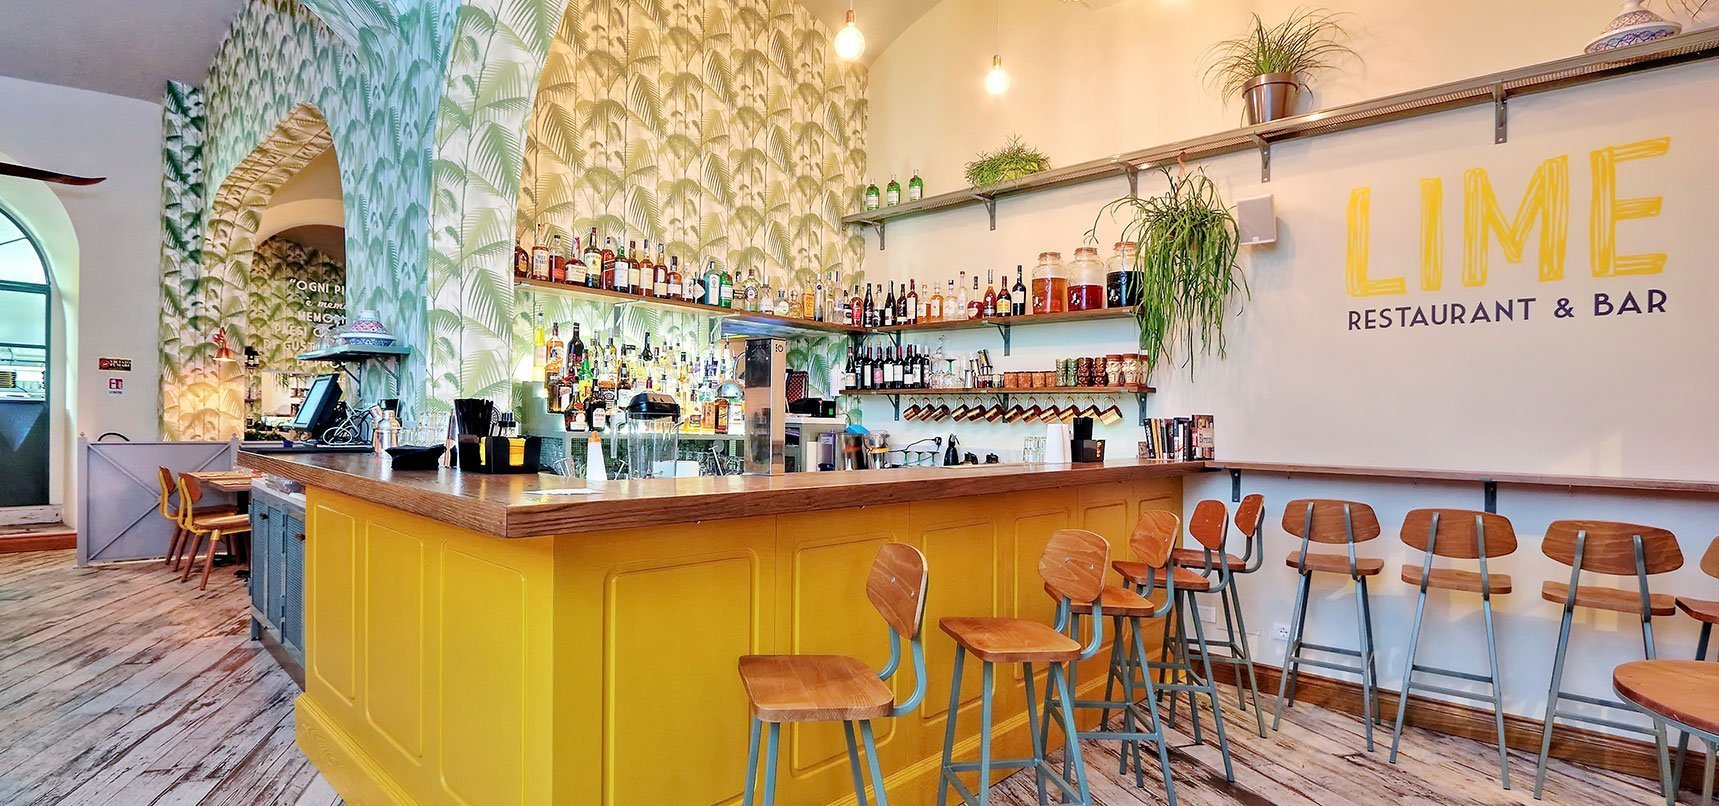 arredamento locali pubblicibar, ristoranti, caffetterie, panifici, paninoteche, pizzerie, cocktail bar, wine bar, enoteche, street food